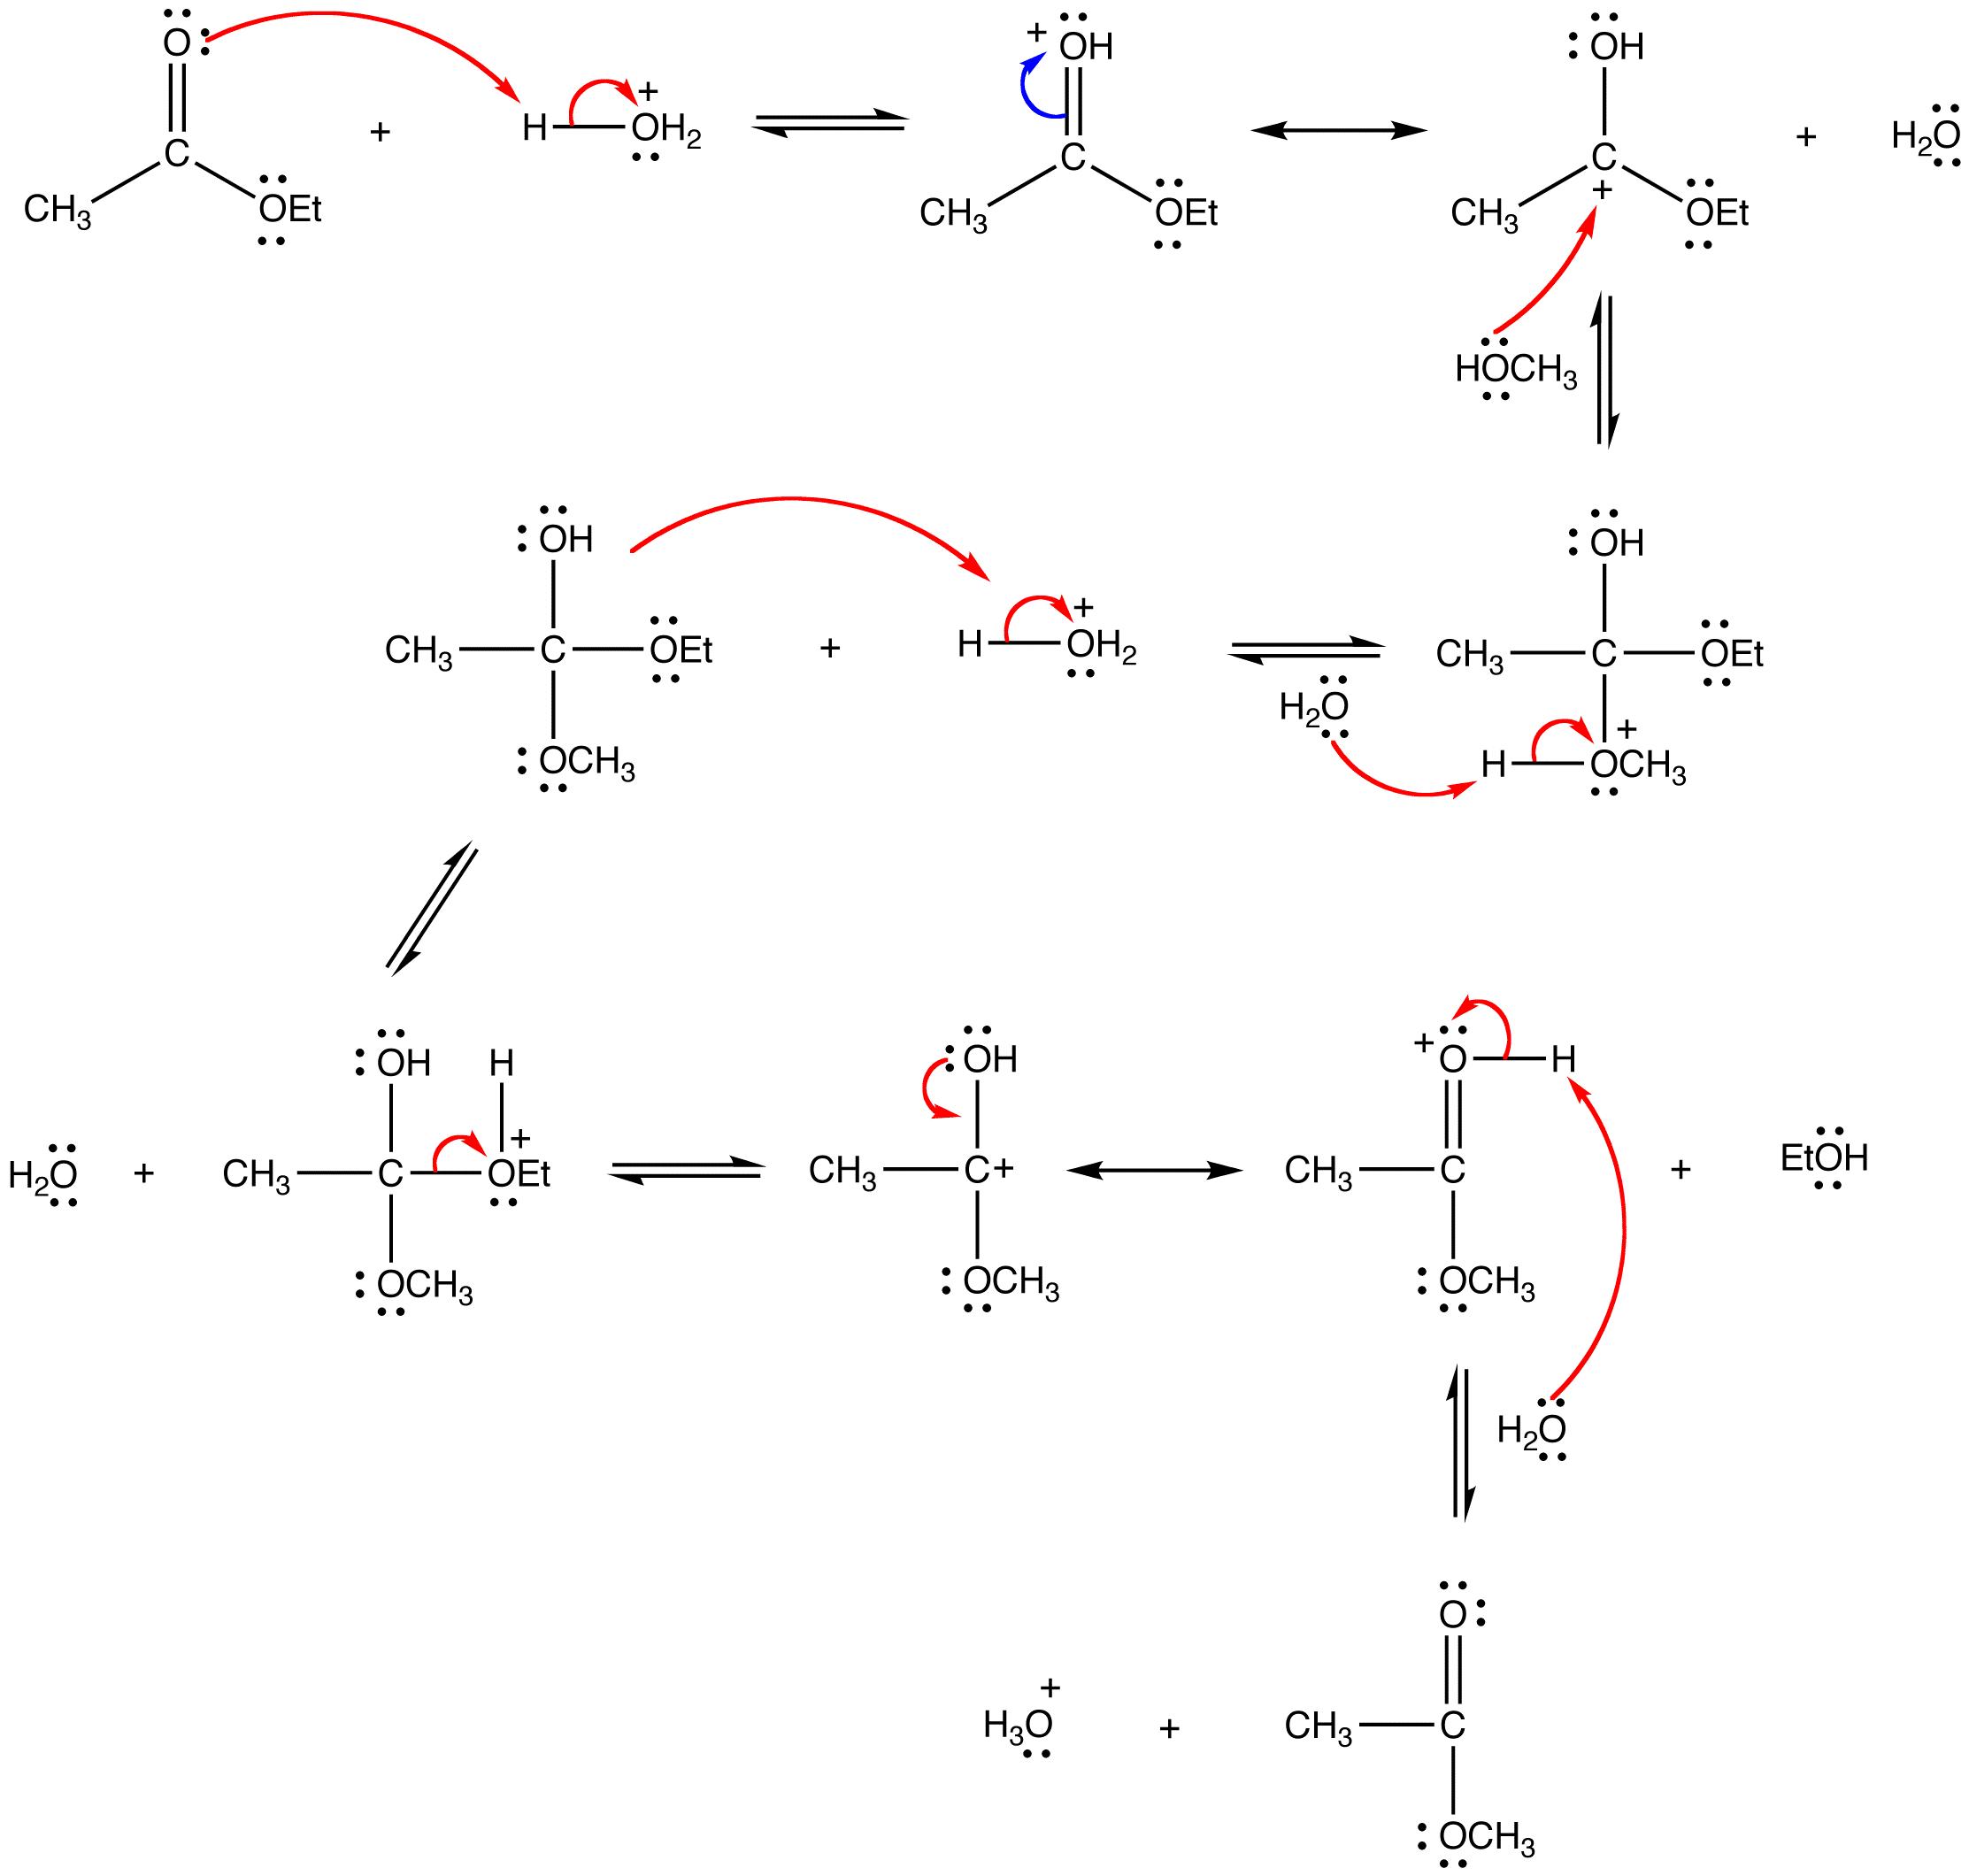 Transesterification Ochempal